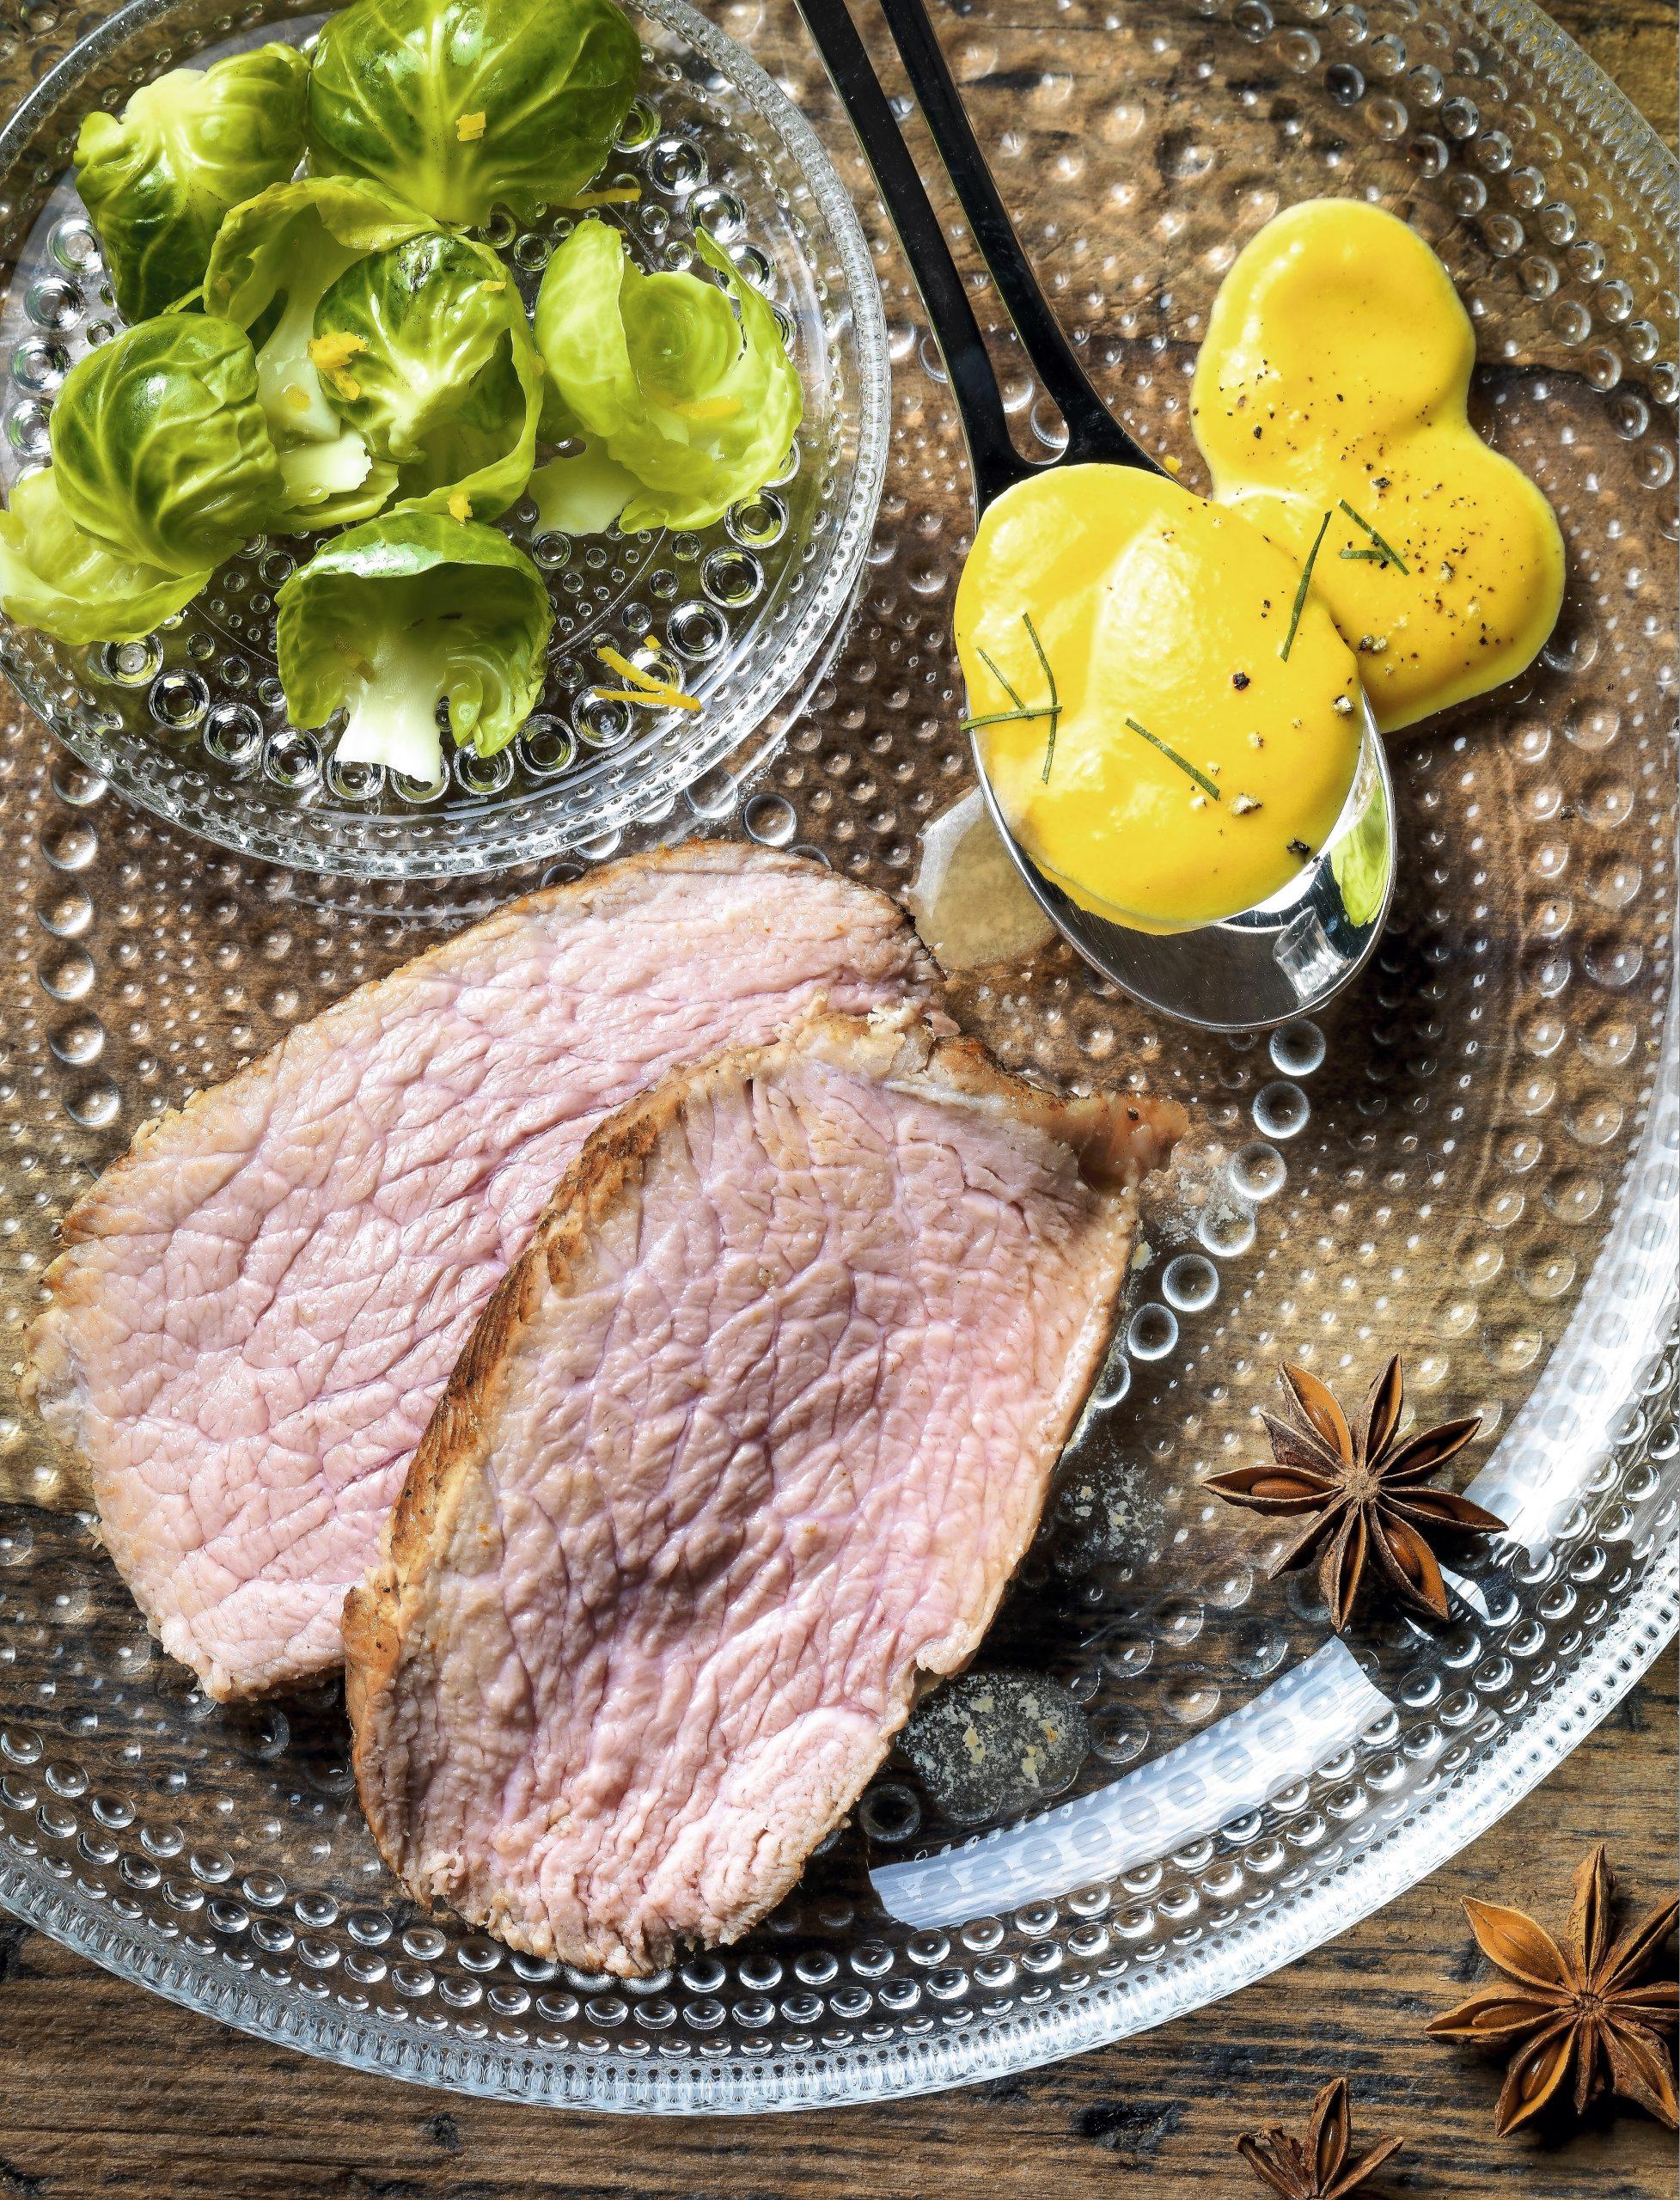 Kalbsbraten mit Sternanis- Rüebli-Sauce